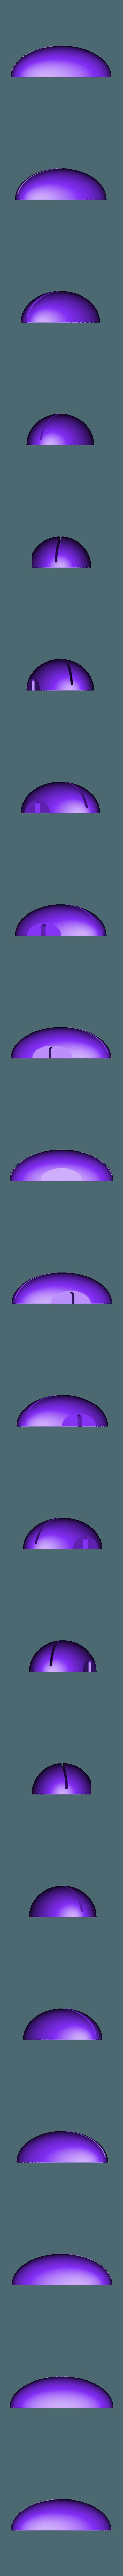 porte_photo.stl Download free STL file Spherical photo holder #HP3D • 3D printing object, magou